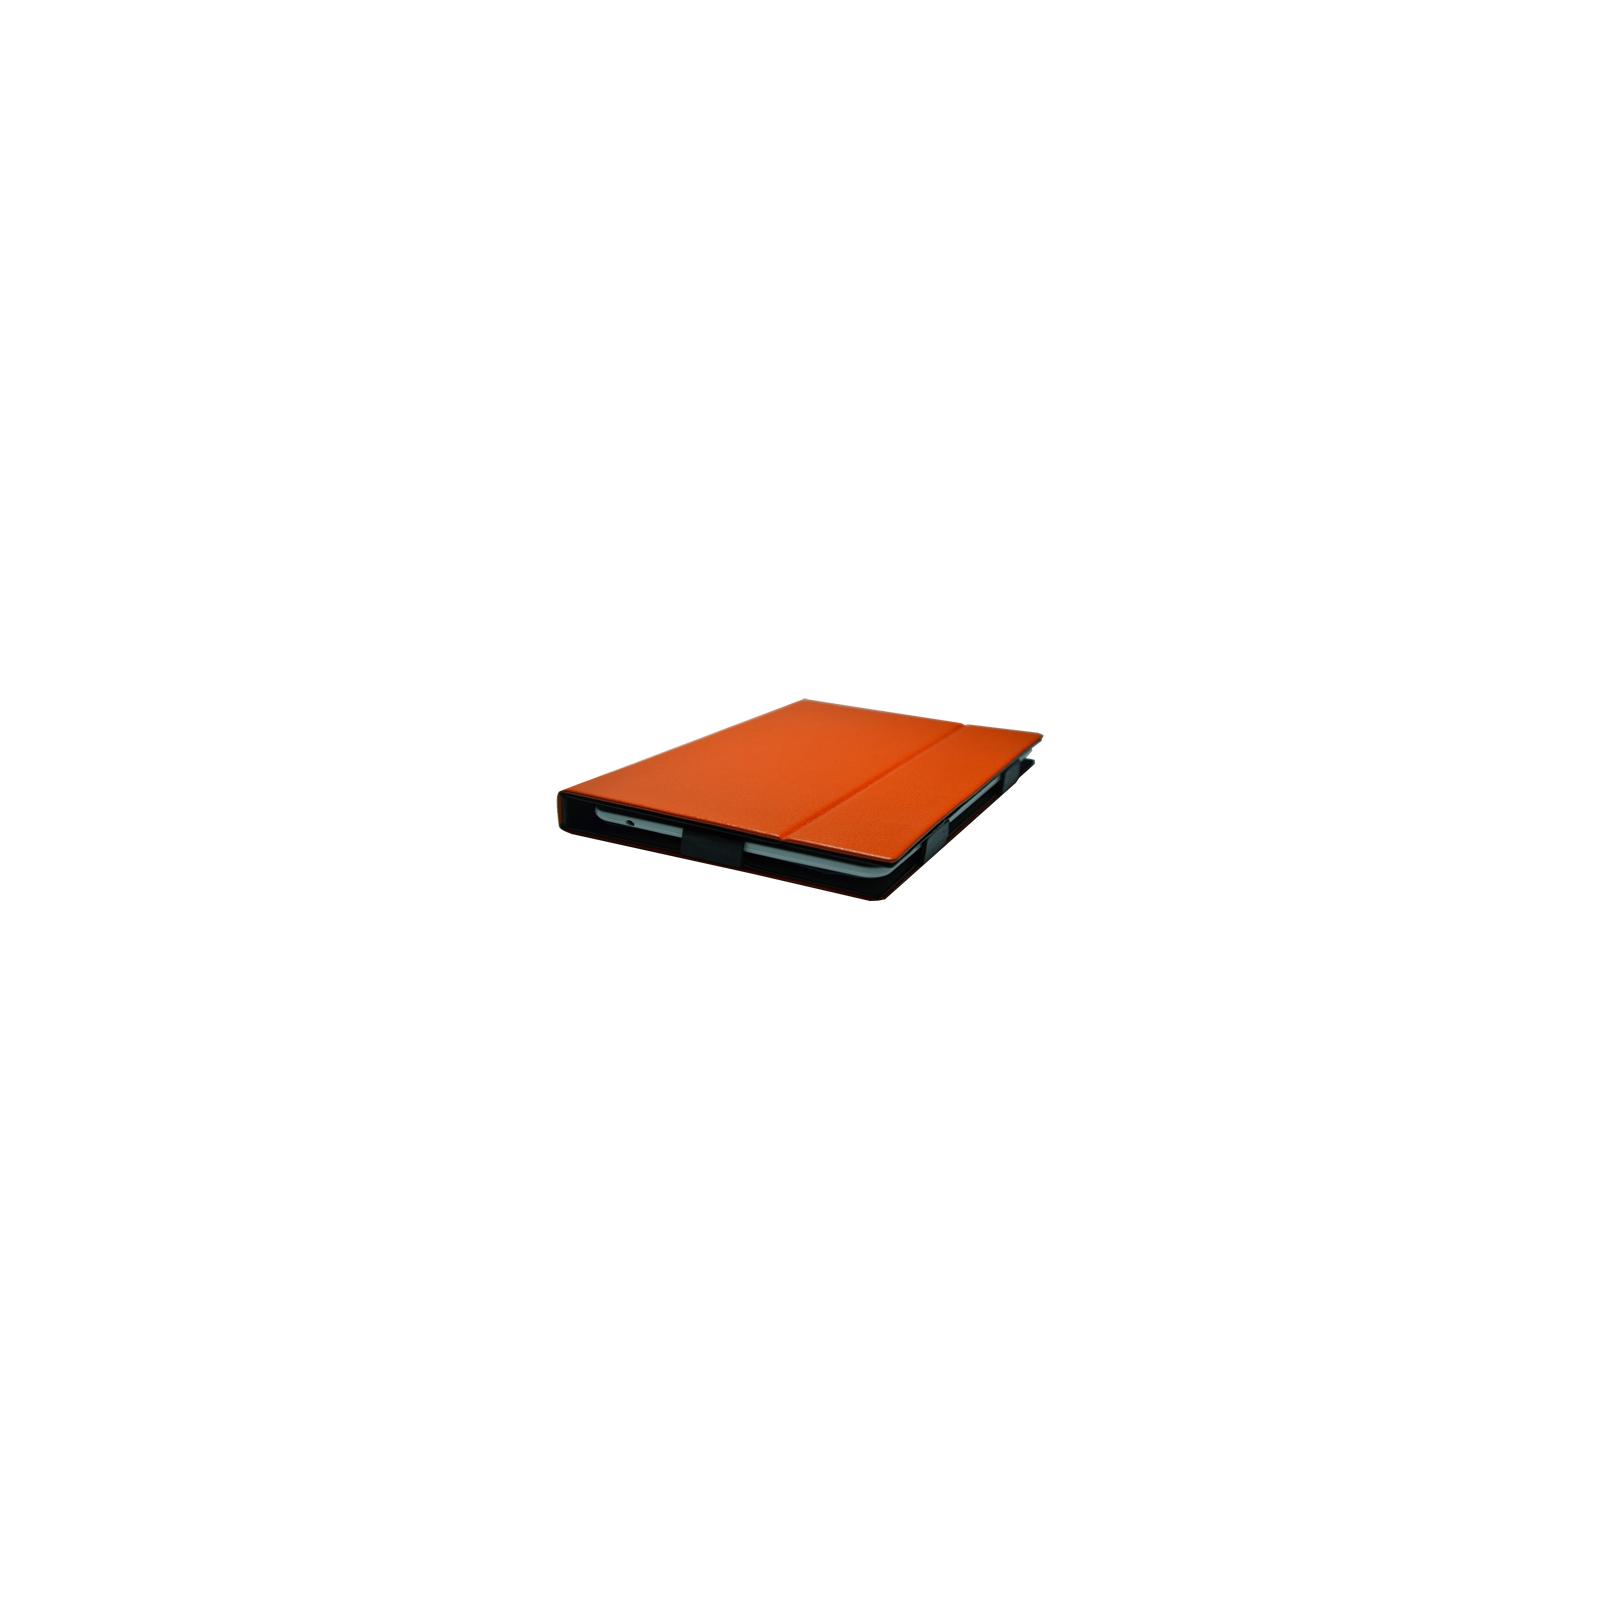 Чехол для планшета Vento 9.7 Desire Bright - orange изображение 3